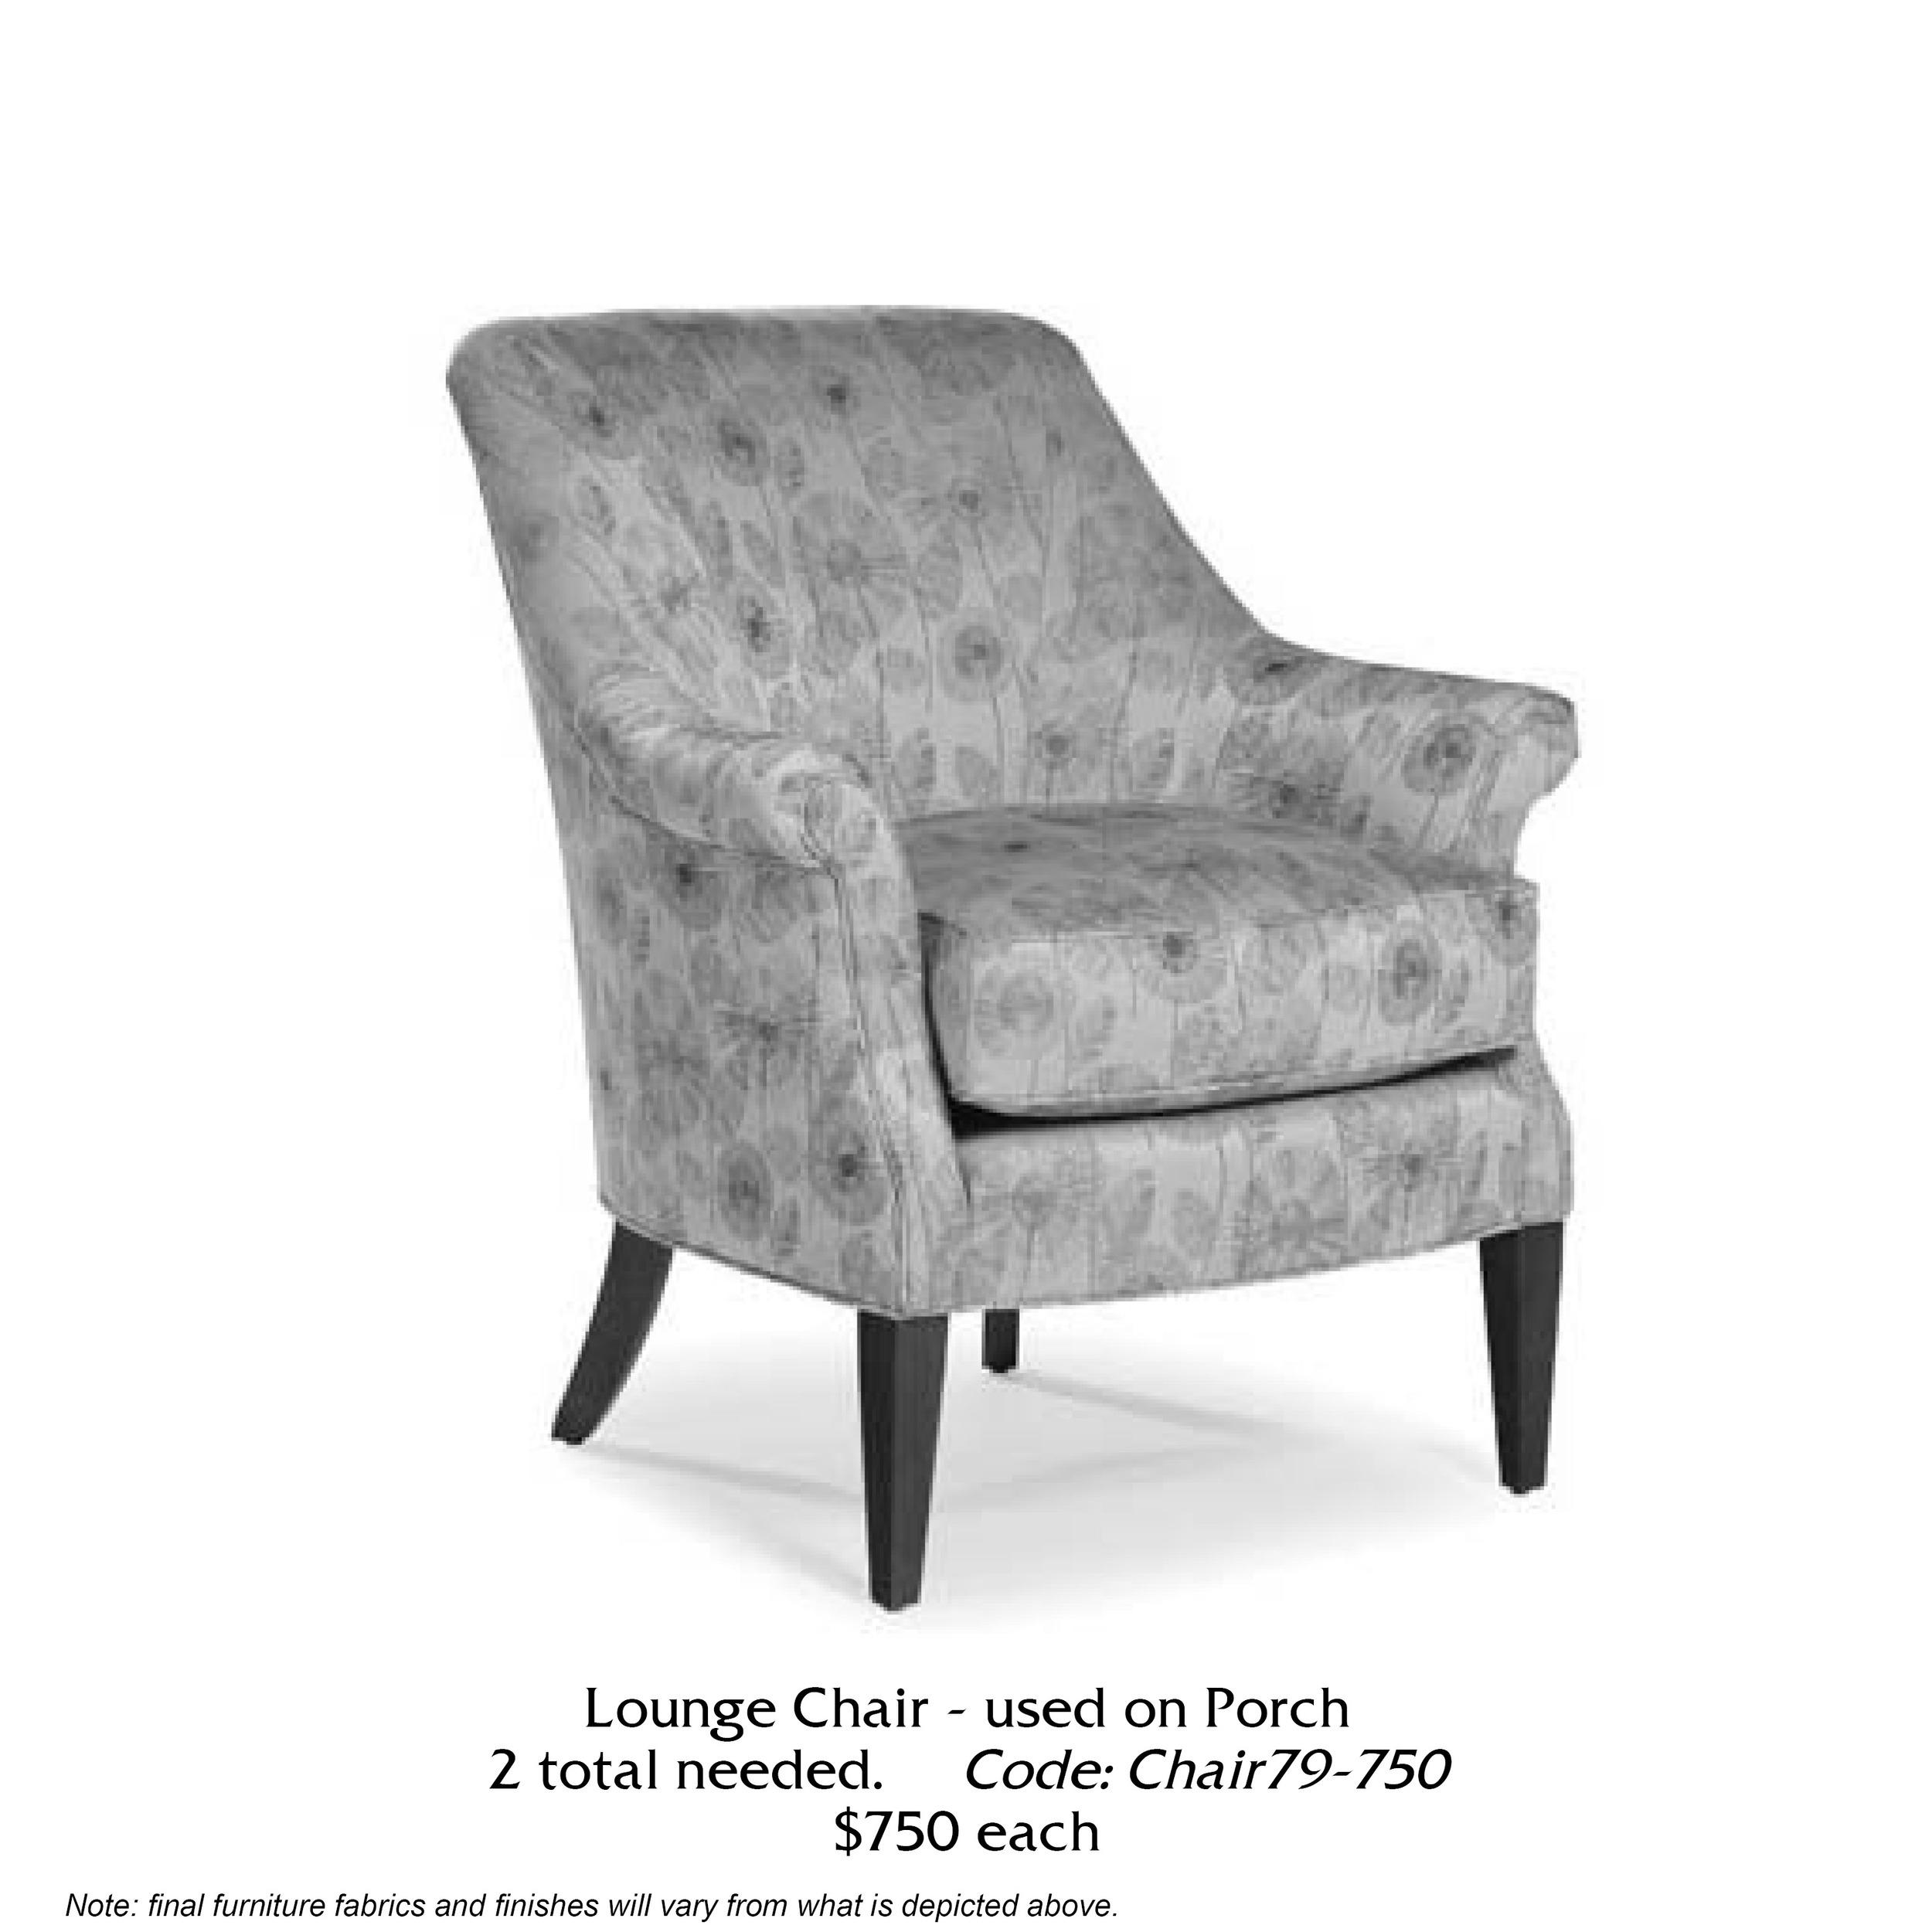 B127-F79-Lounge Chair - 2.jpg